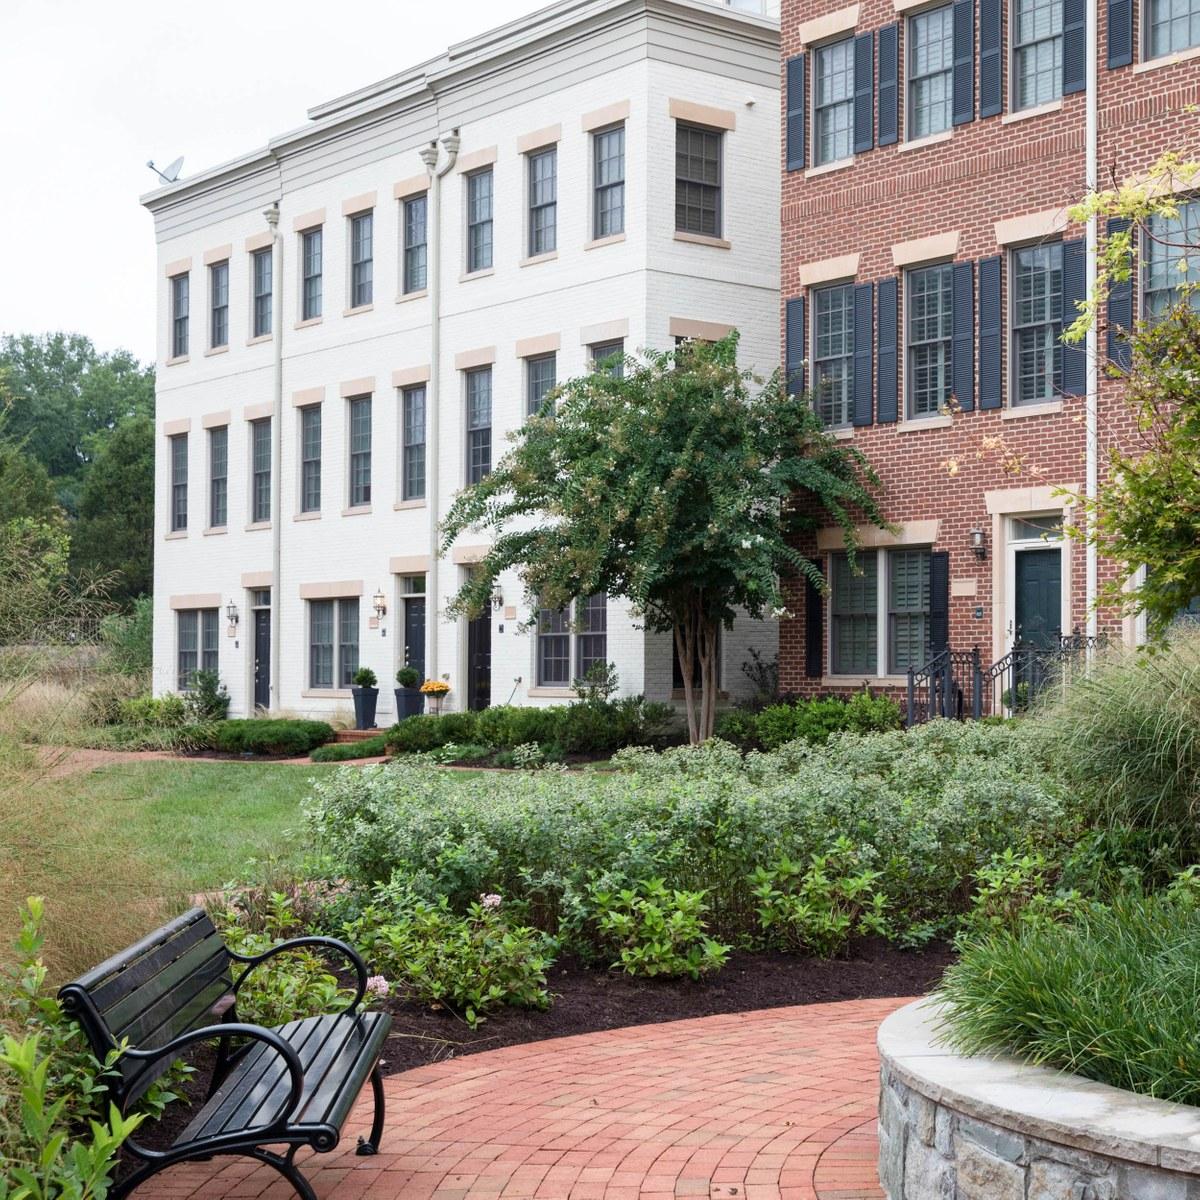 Local Com Homes For Rent: The Palisades, Washington DC - Neighborhood Guide